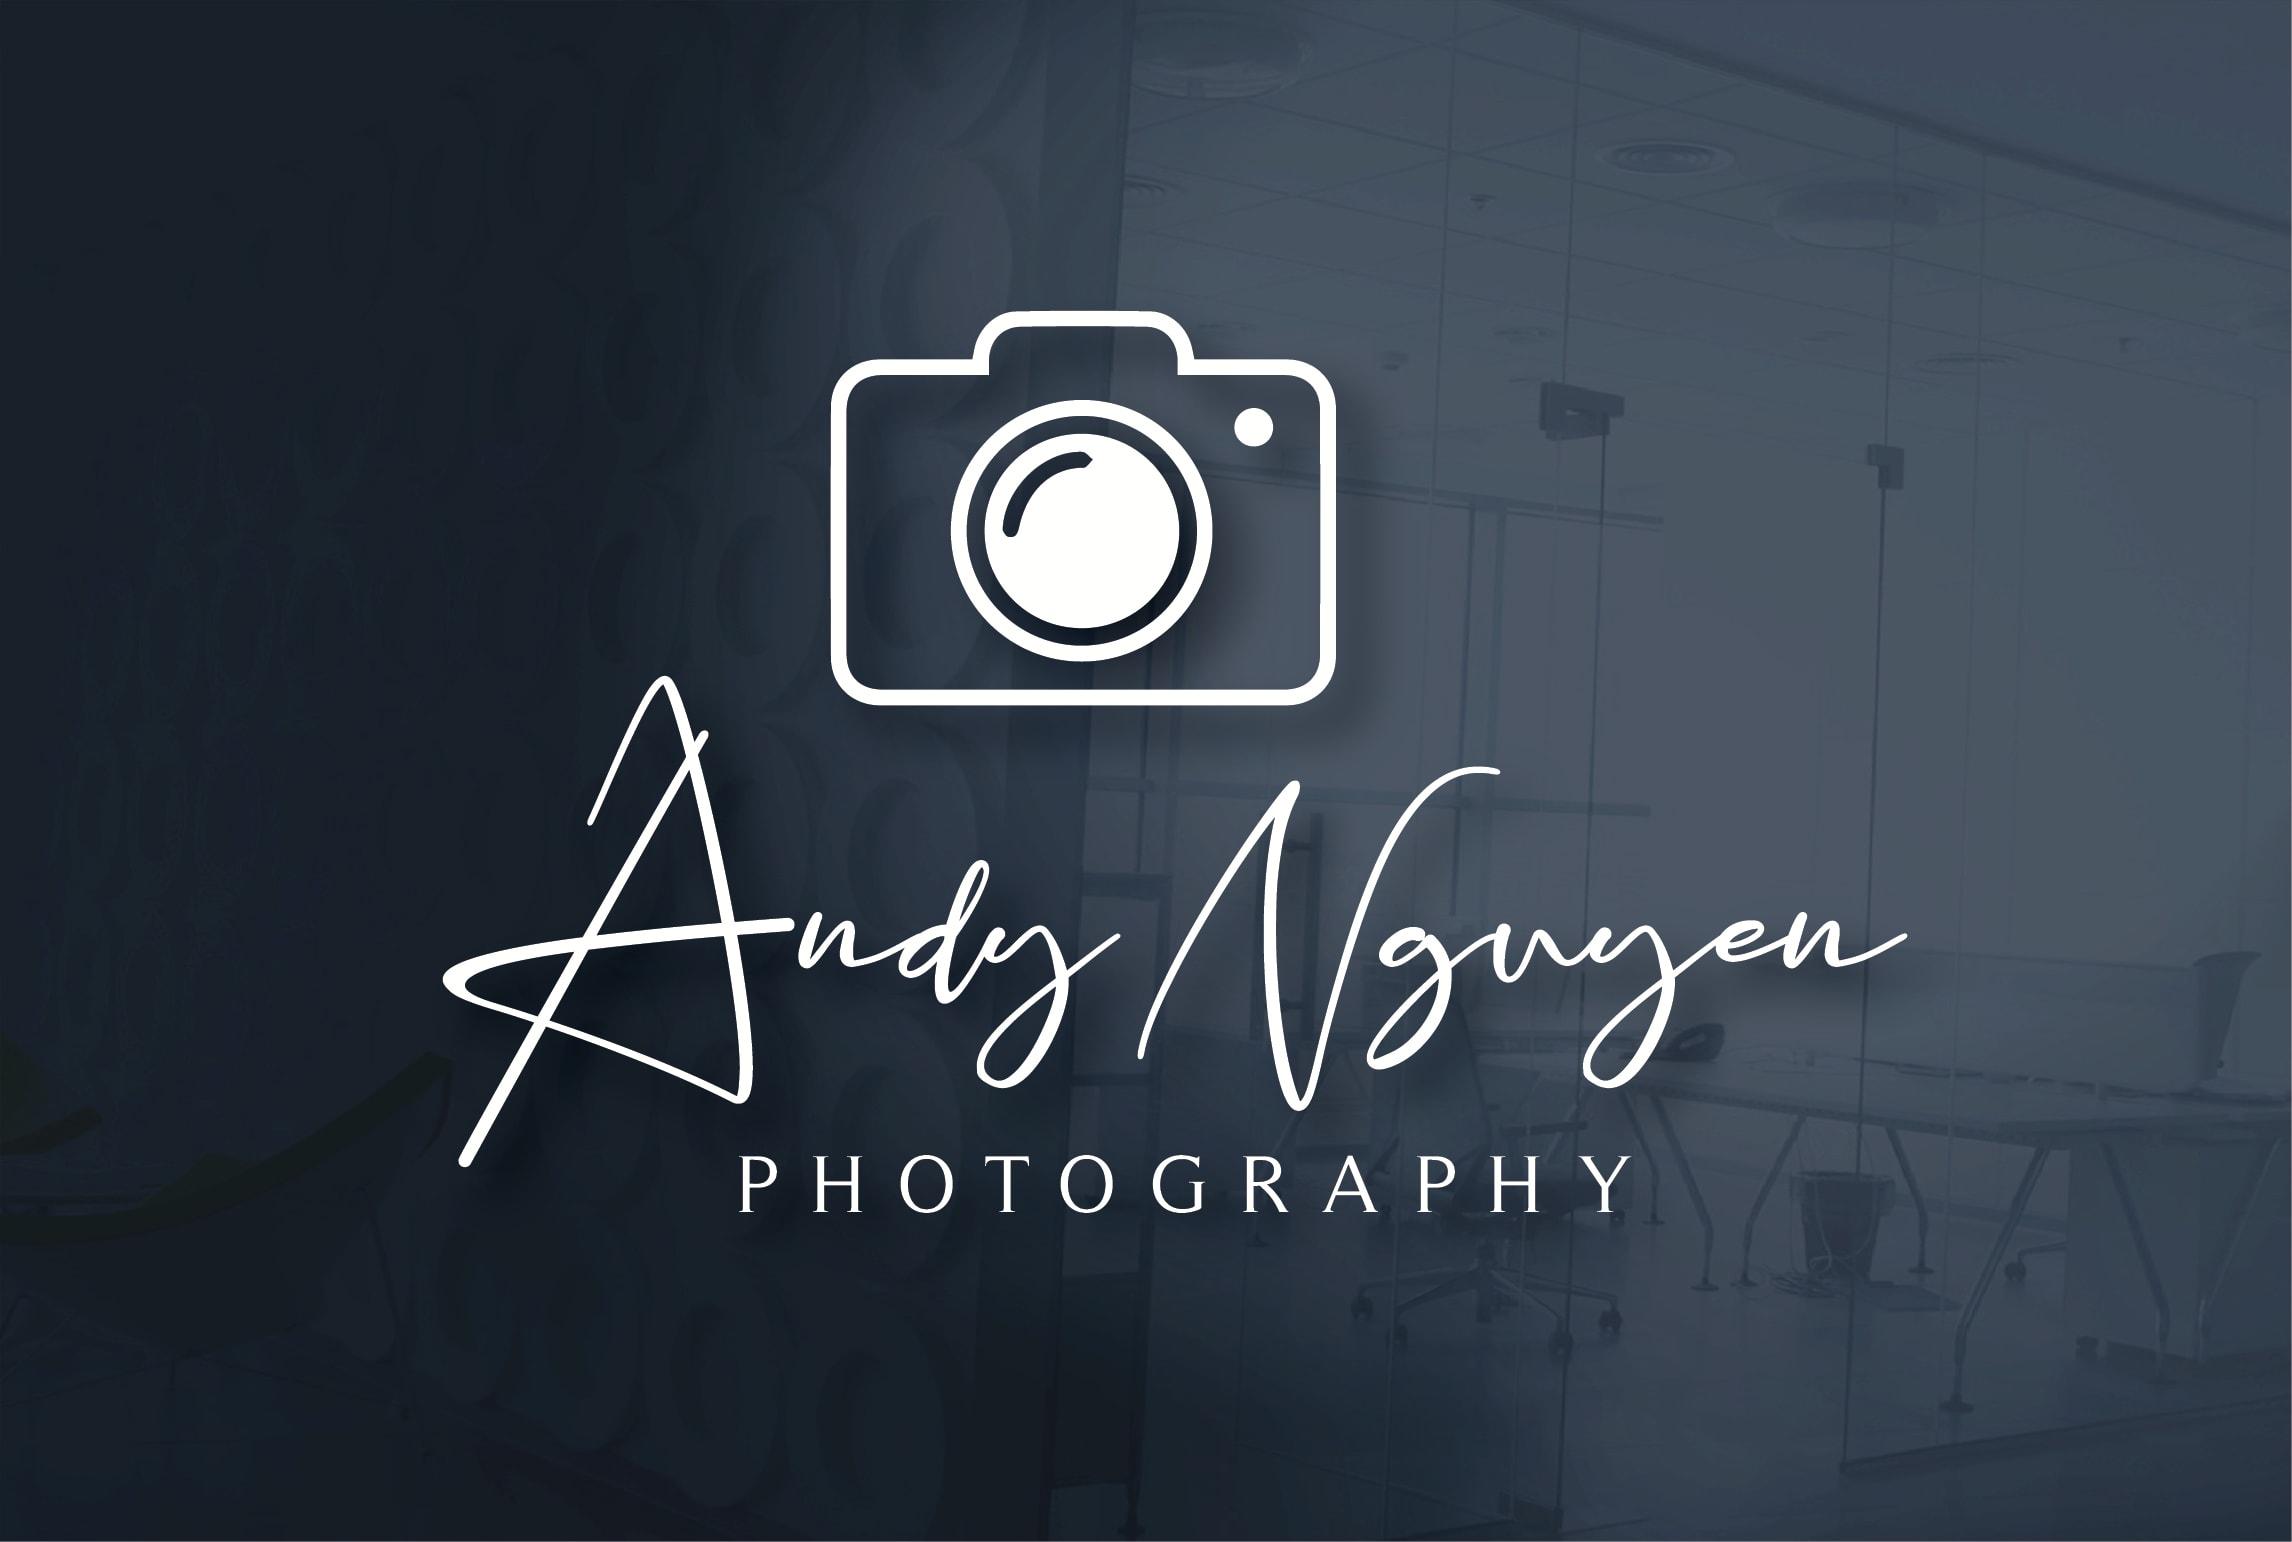 Design A Modern Watermark Photography Logo By Mi Graphix